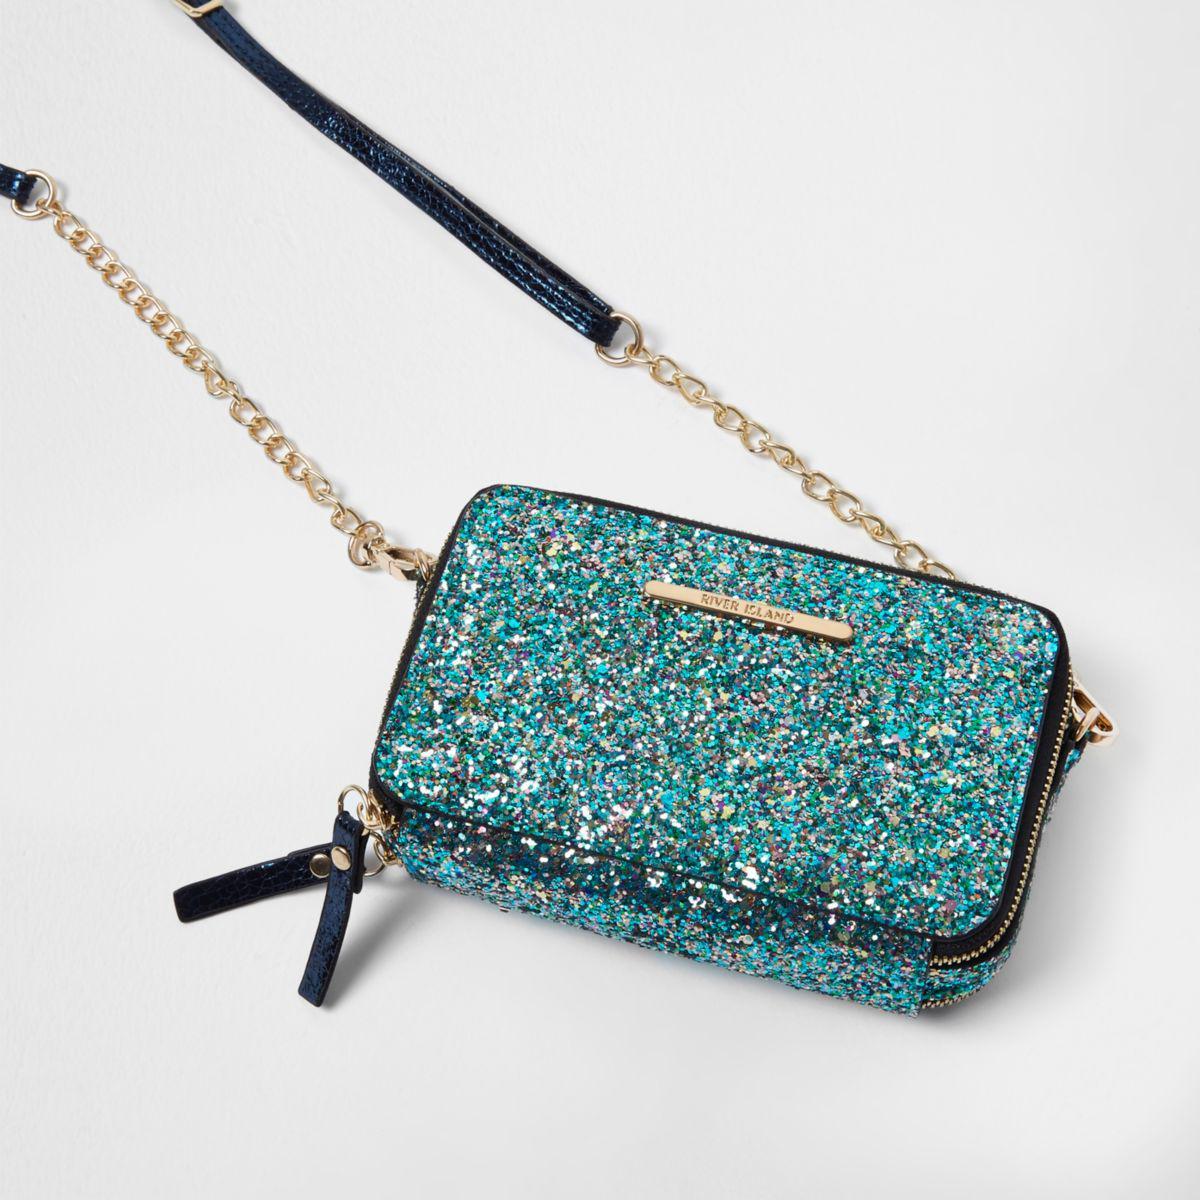 Lyst - River Island Blue Glitter Cross Body Chain Bag Blue Glitter Cross Body Chain Bag In Blue